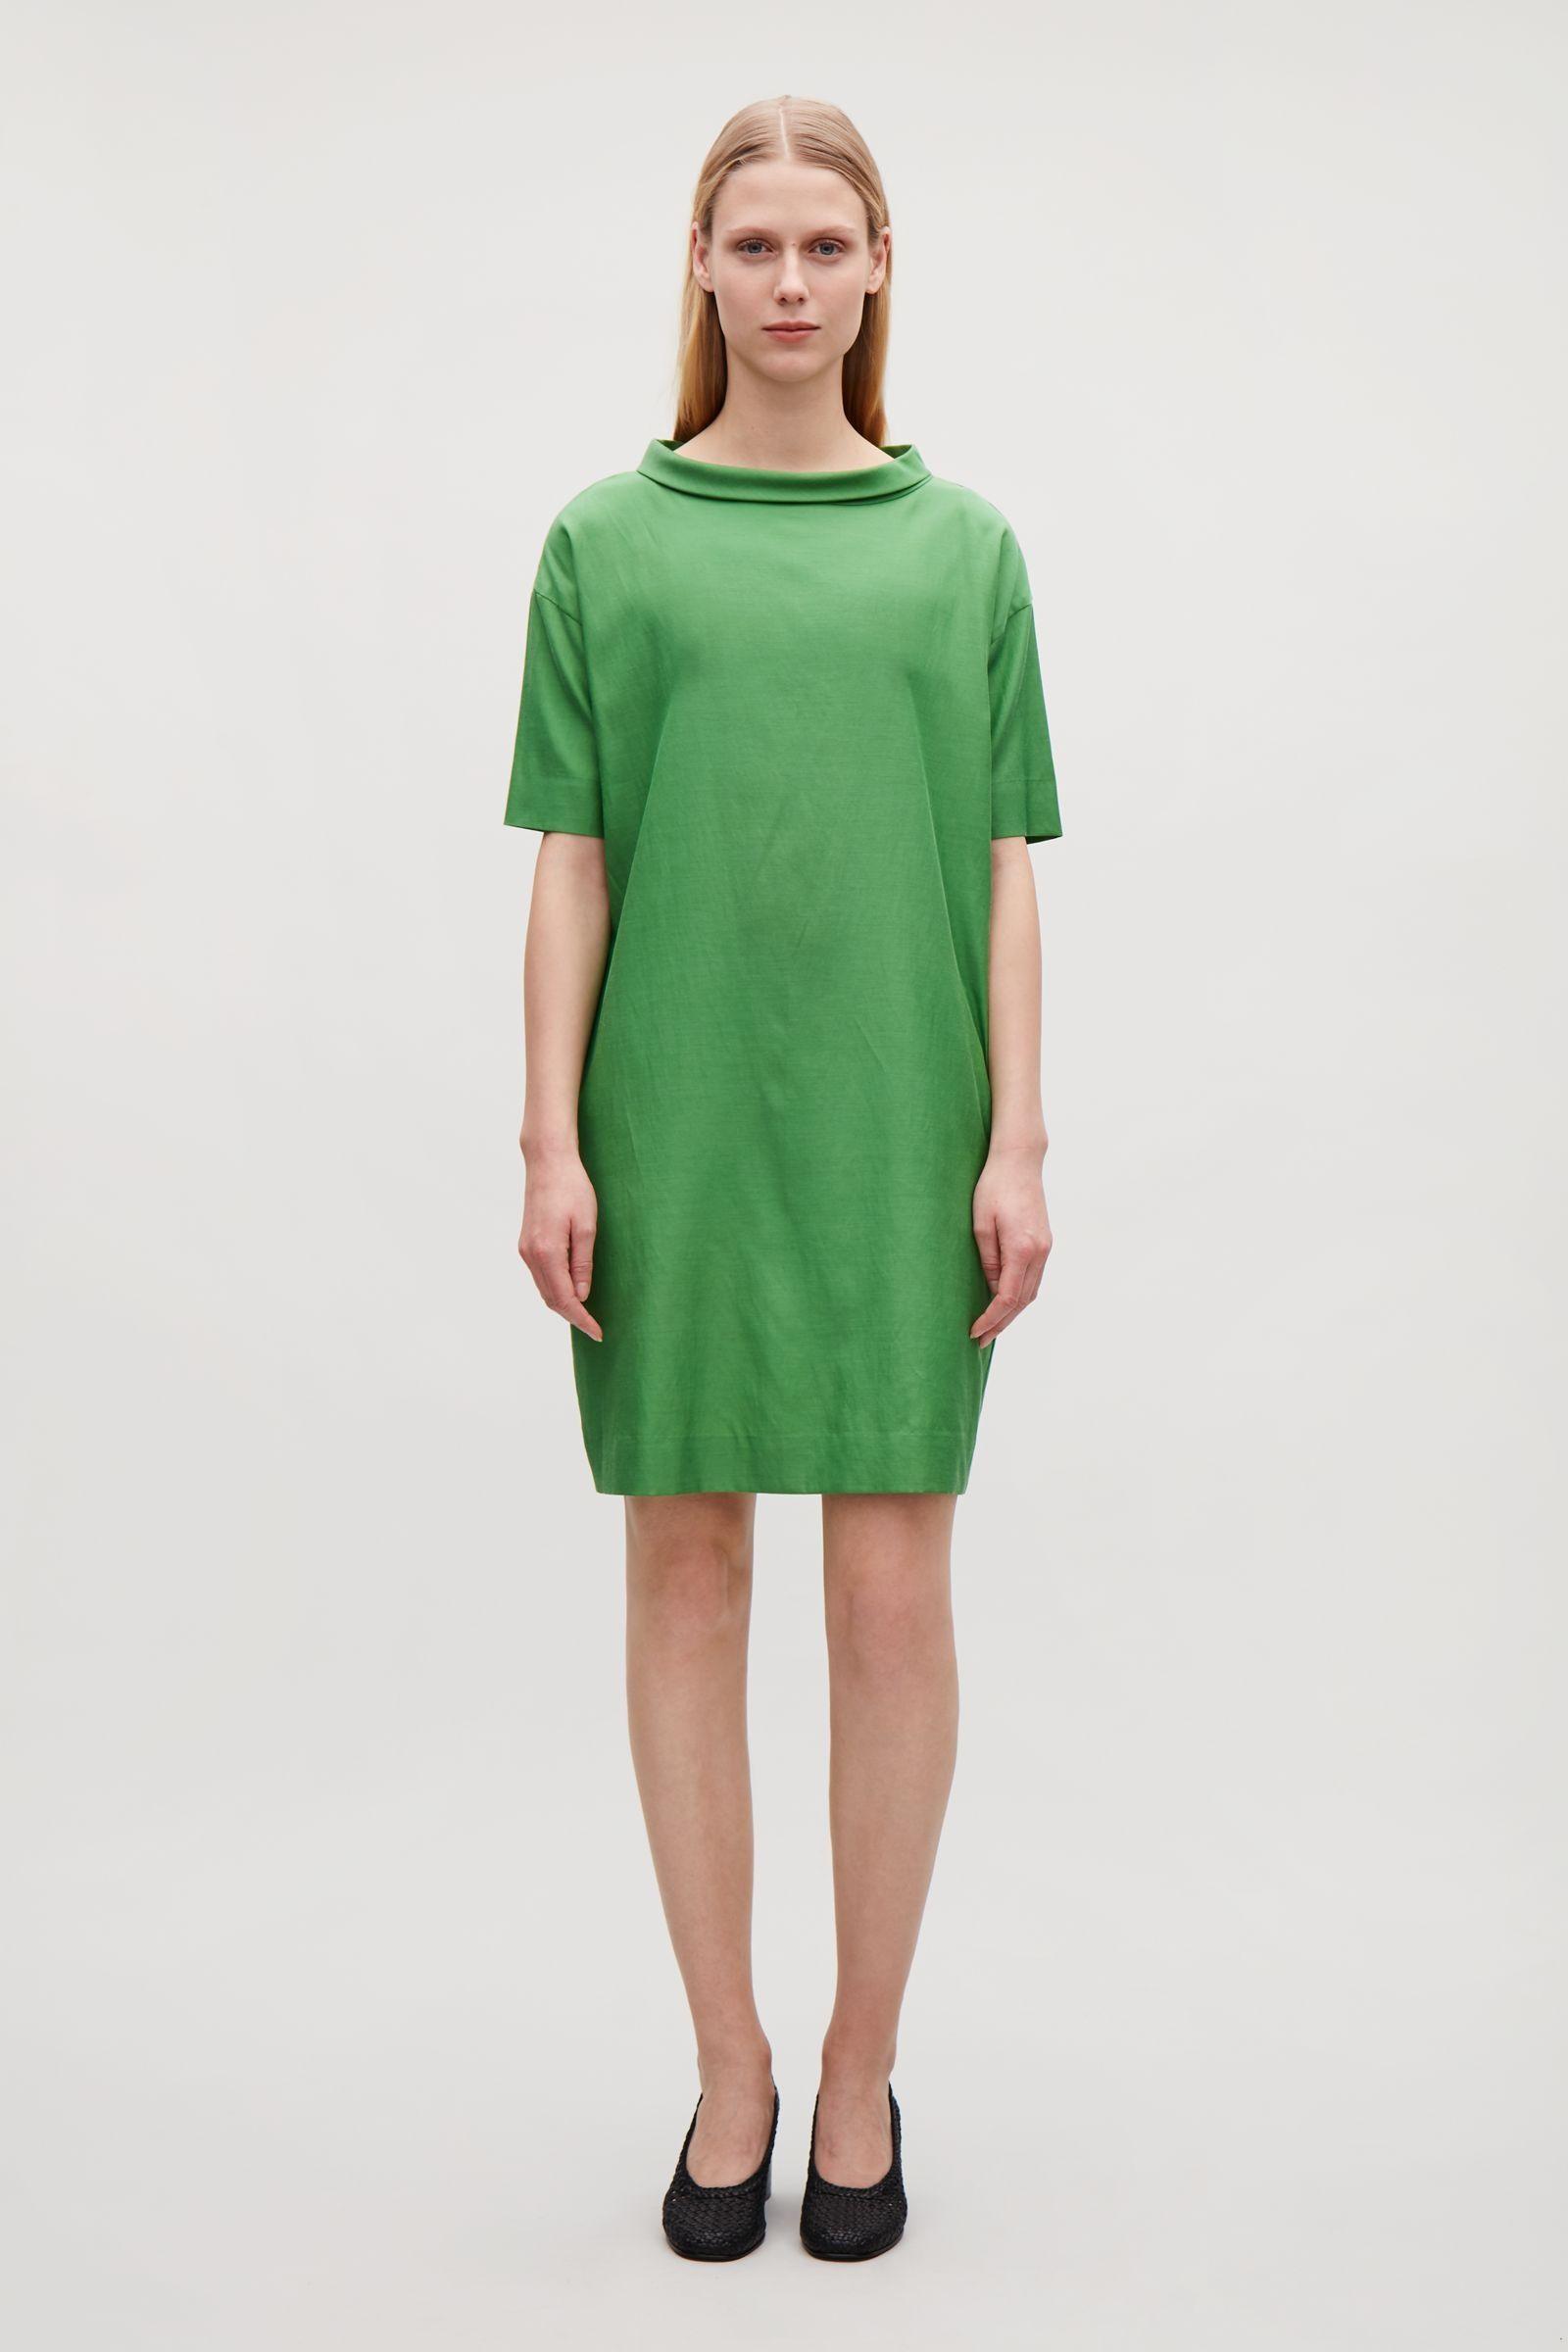 10 Top Cos Abendkleid SpezialgebietDesigner Elegant Cos Abendkleid Galerie